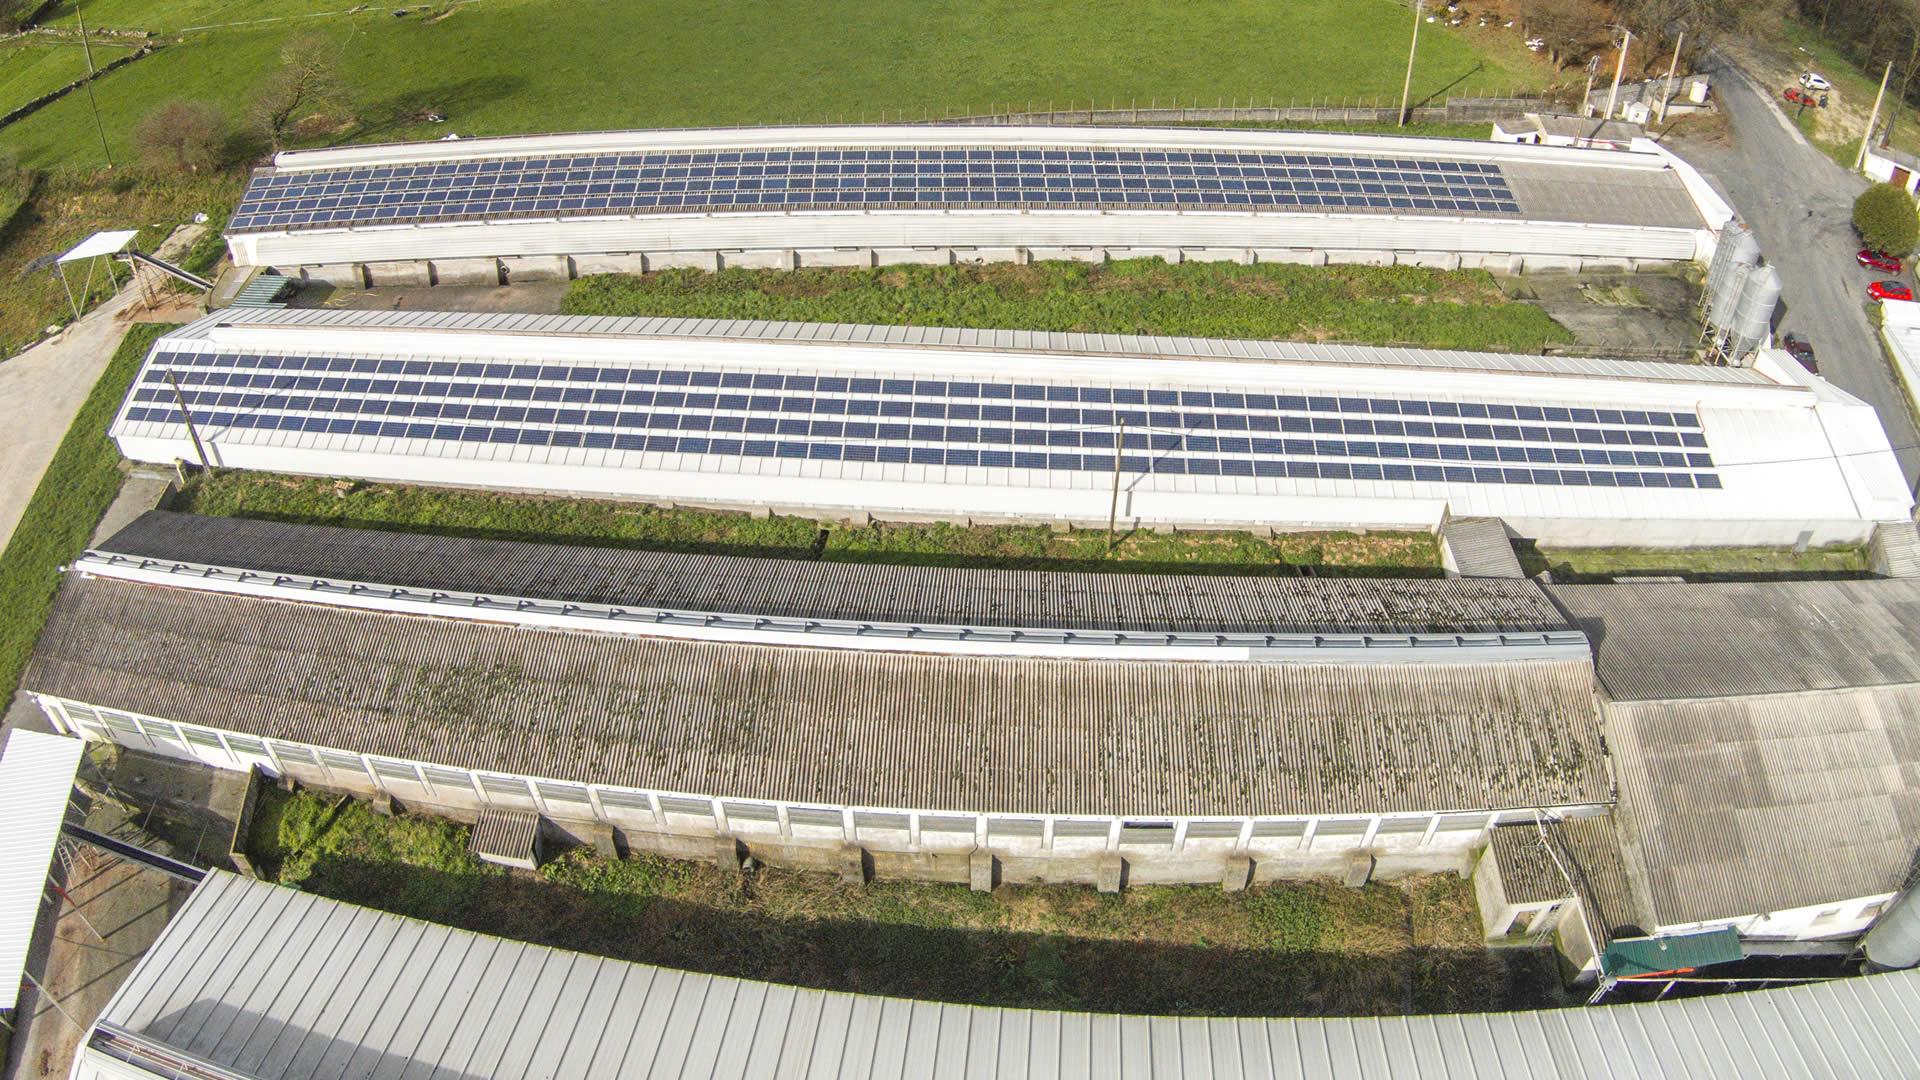 edf-solar-instalacion-paneles-solares-granja-campomayor-2